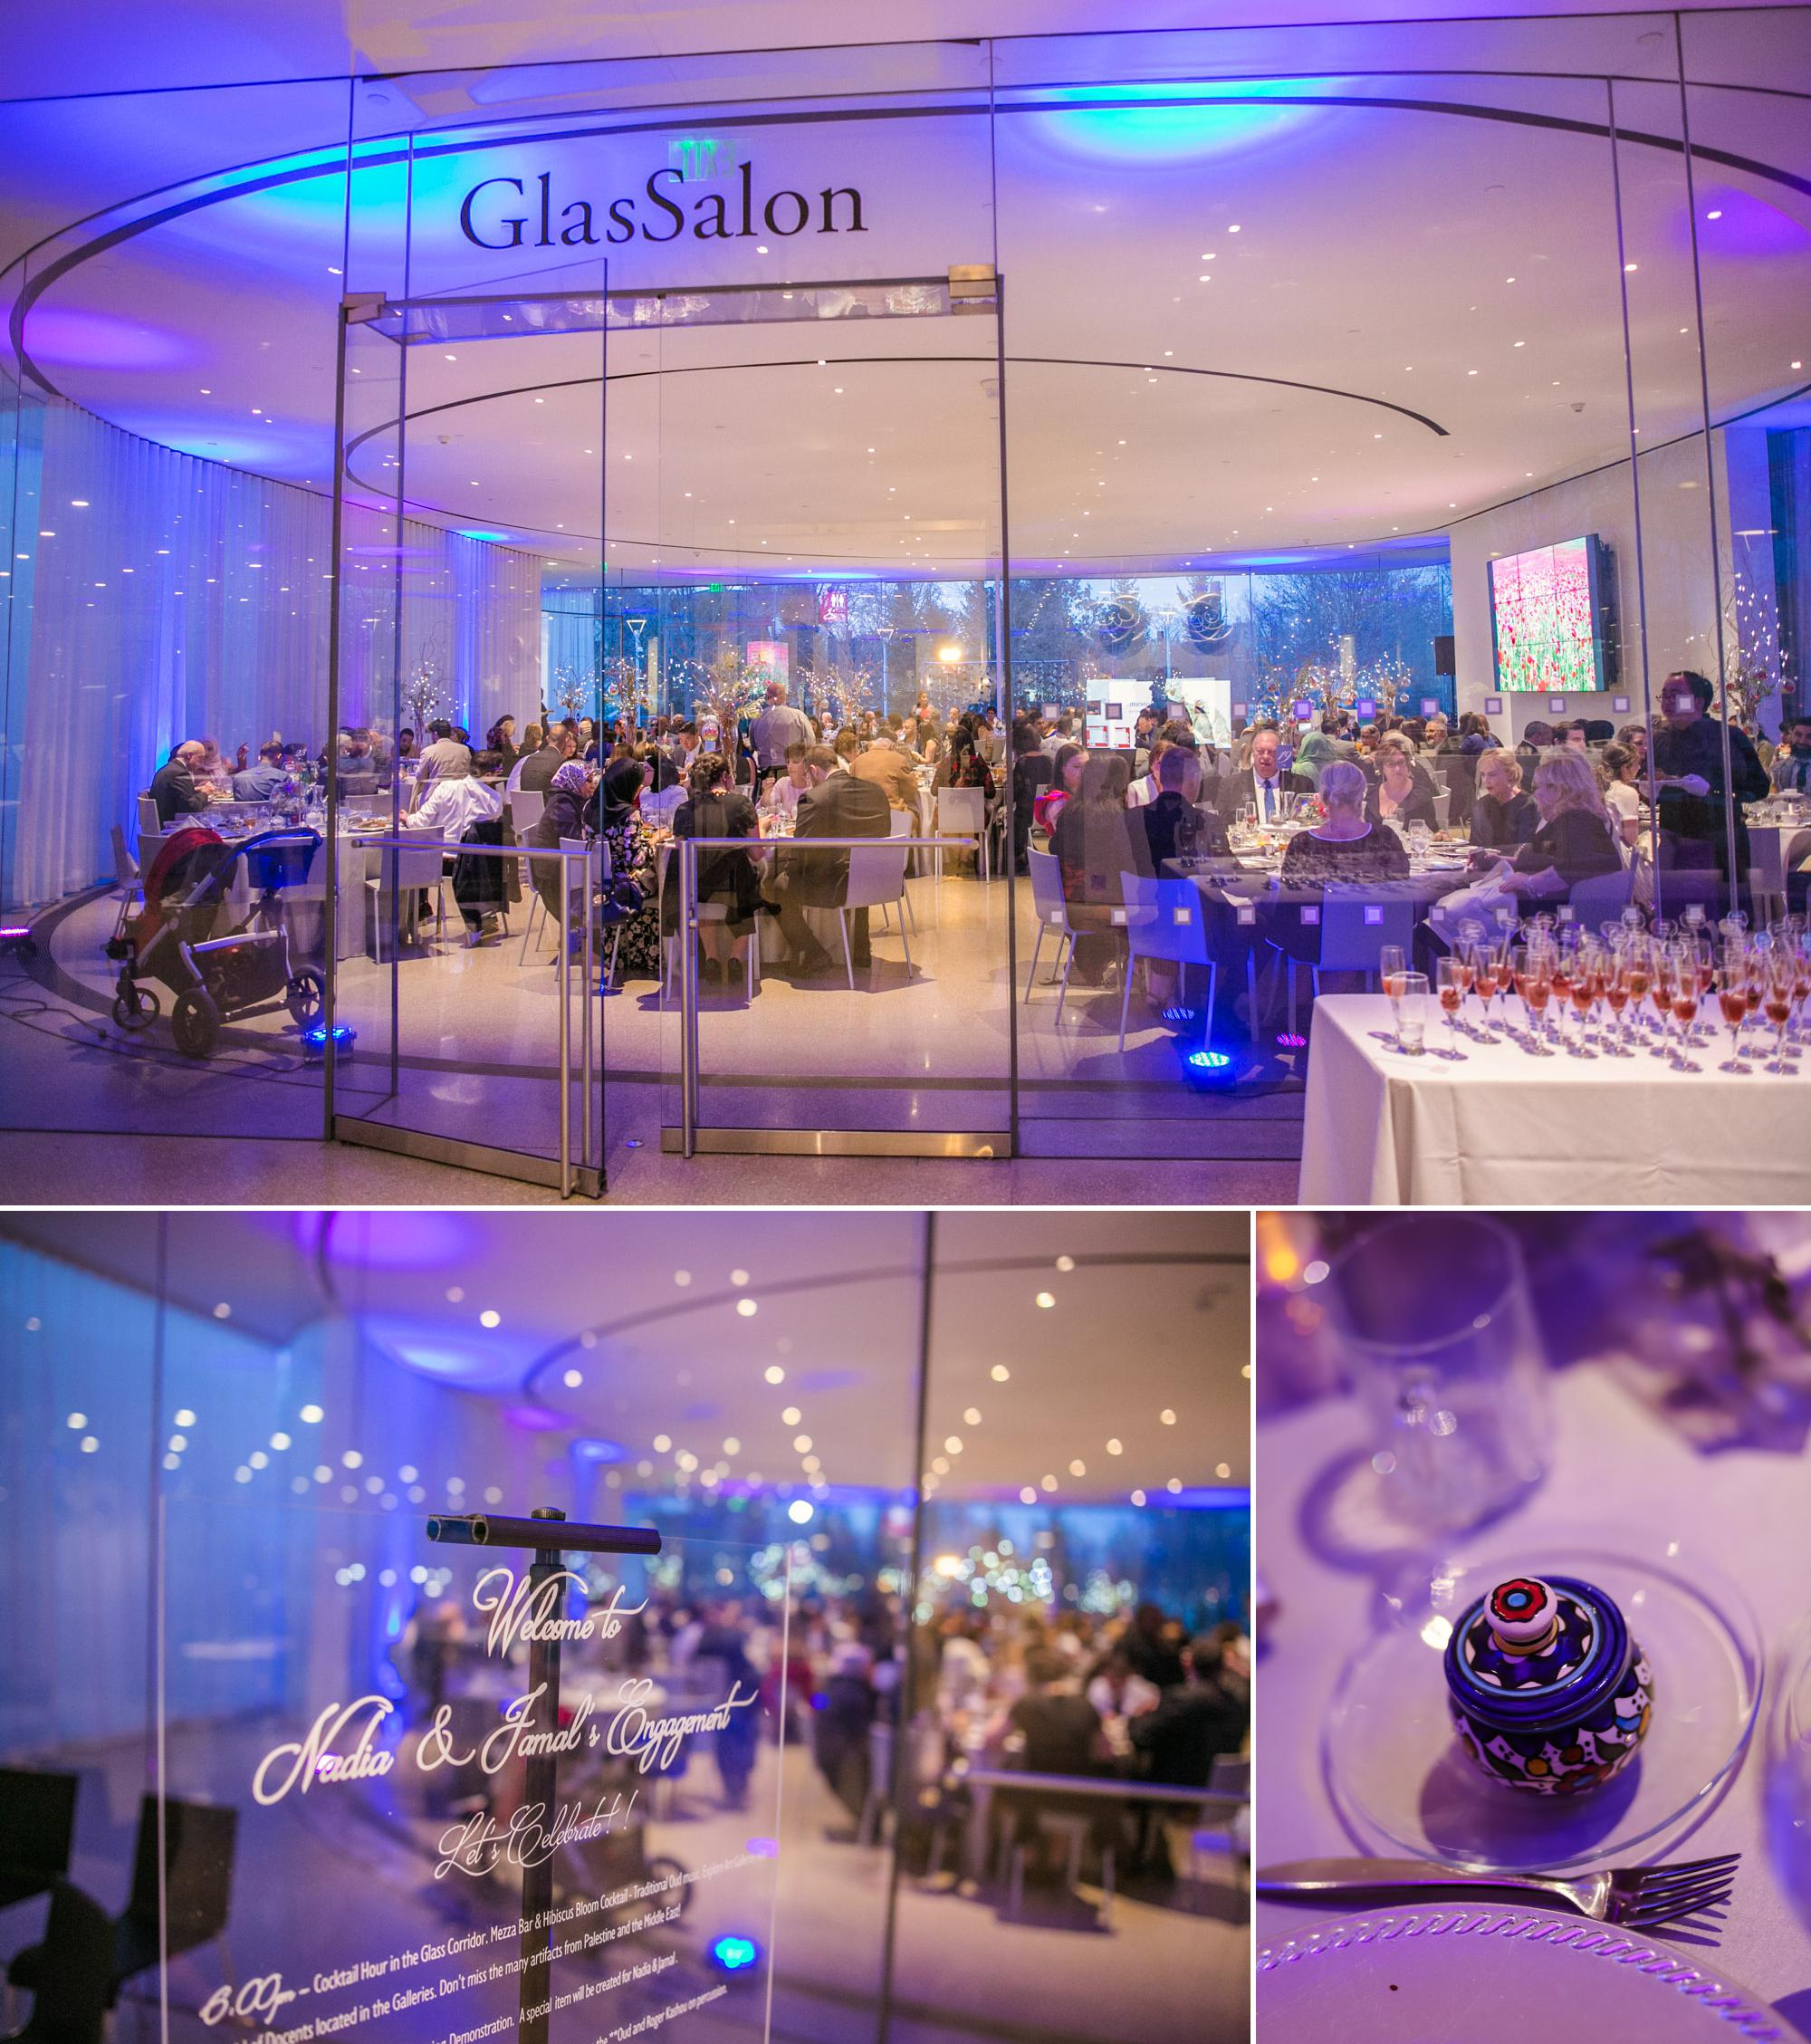 toledo-museum-glass-pavilion-wedding-photos-12.jpg